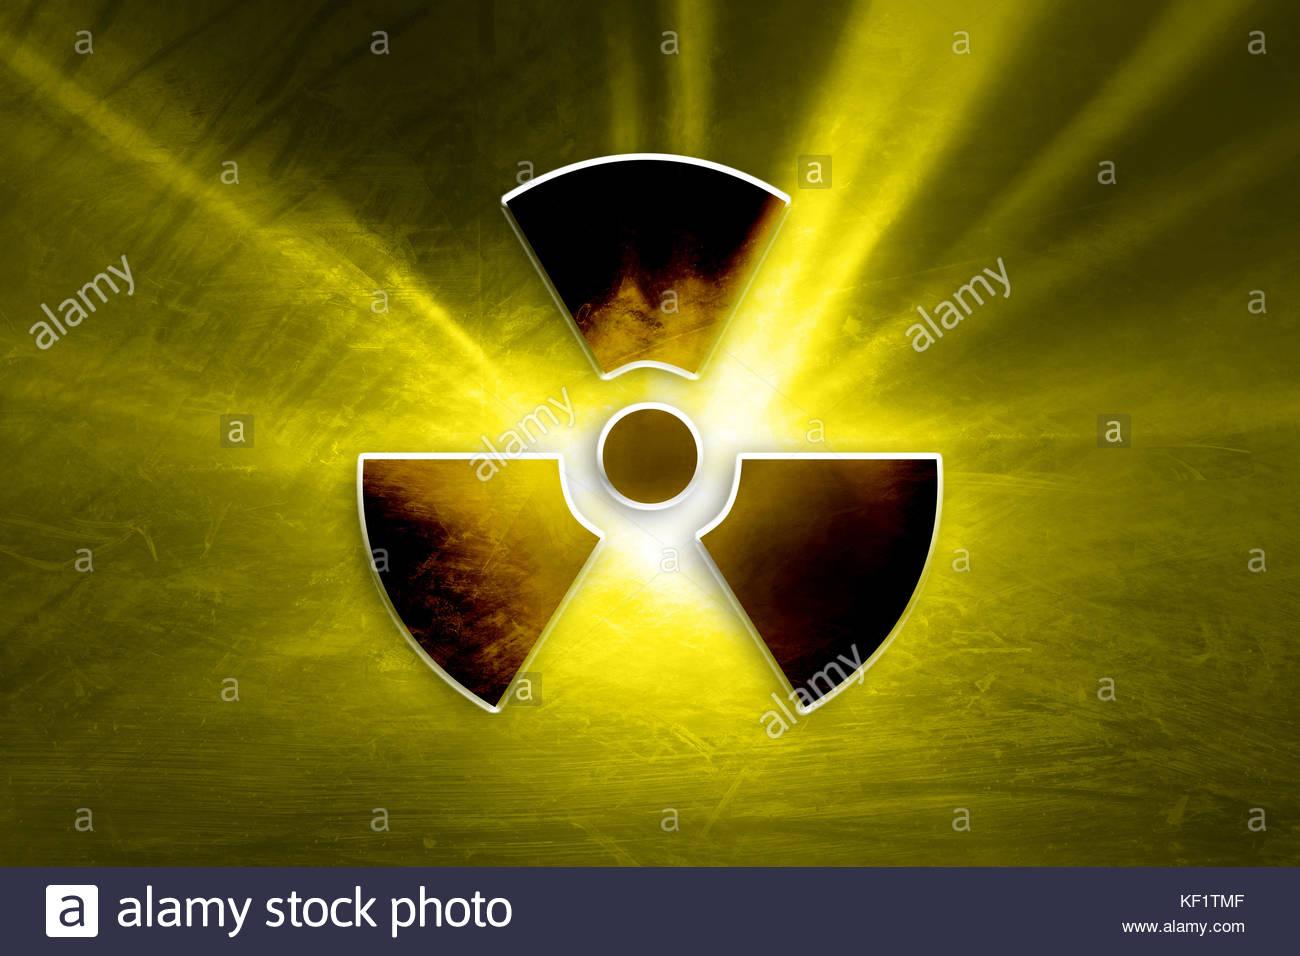 Conceptual dark grunge radioactive symbol on the textured yellow conceptual dark grunge radioactive symbol on the textured yellow colored illustration background buycottarizona